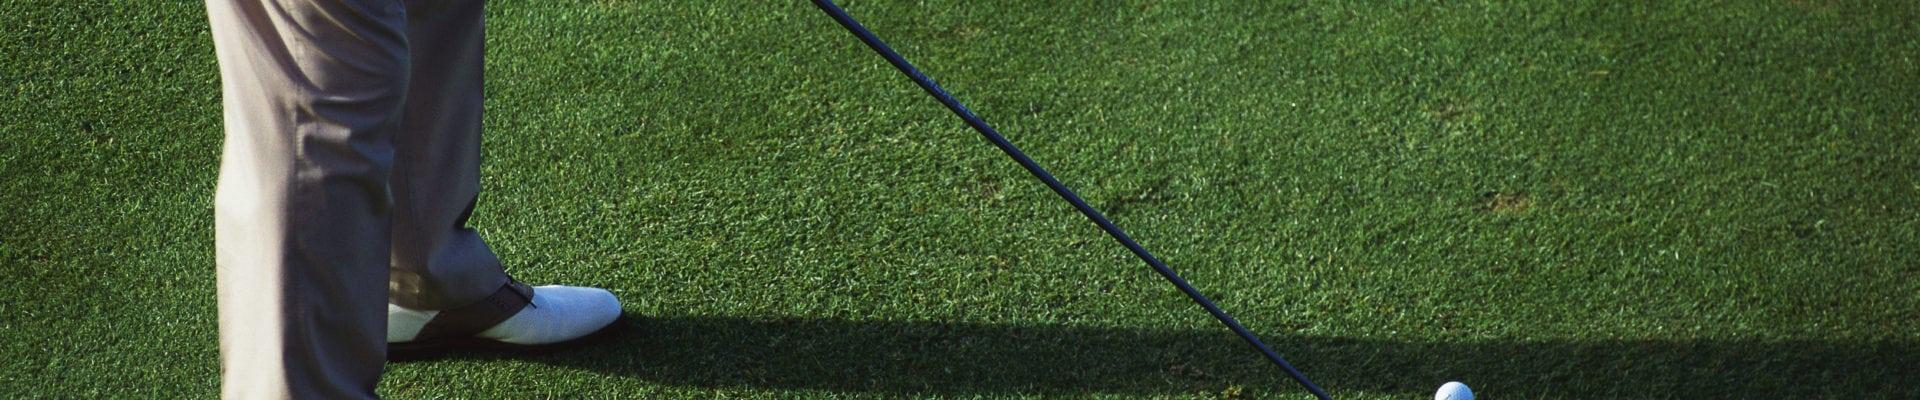 Kunstgras golf